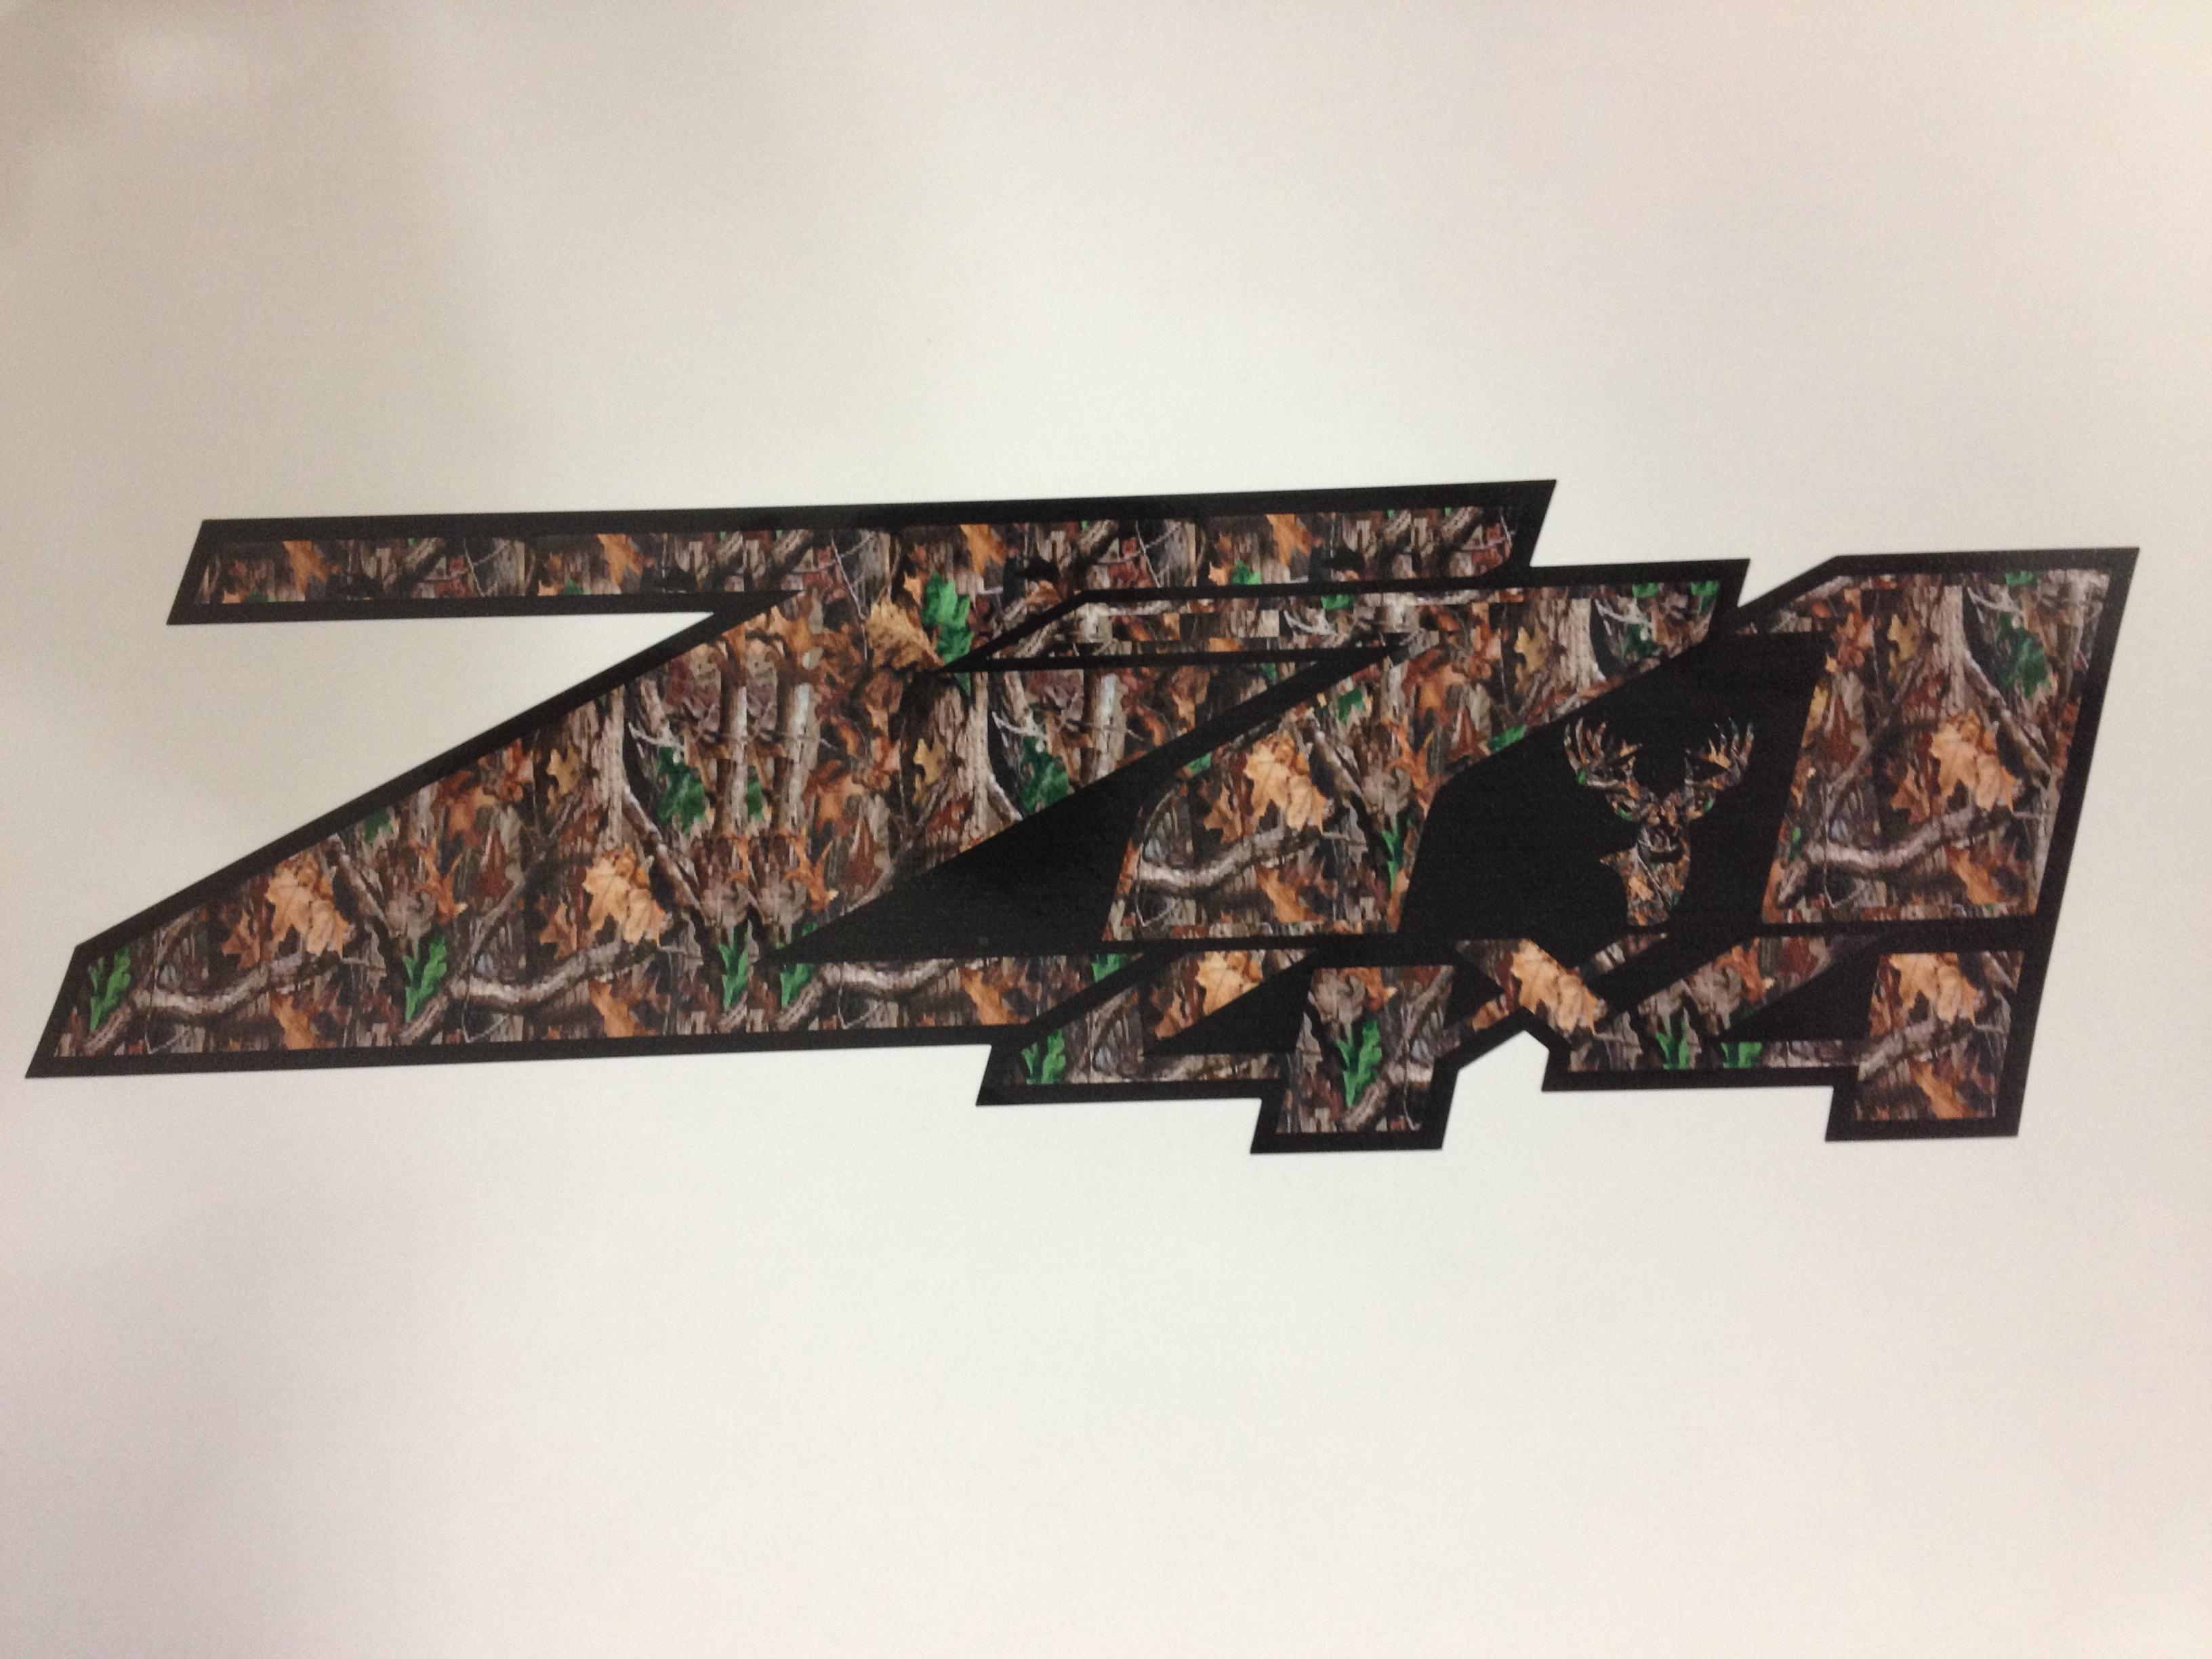 Camo Chevy Wallpaper Wallpapersafari